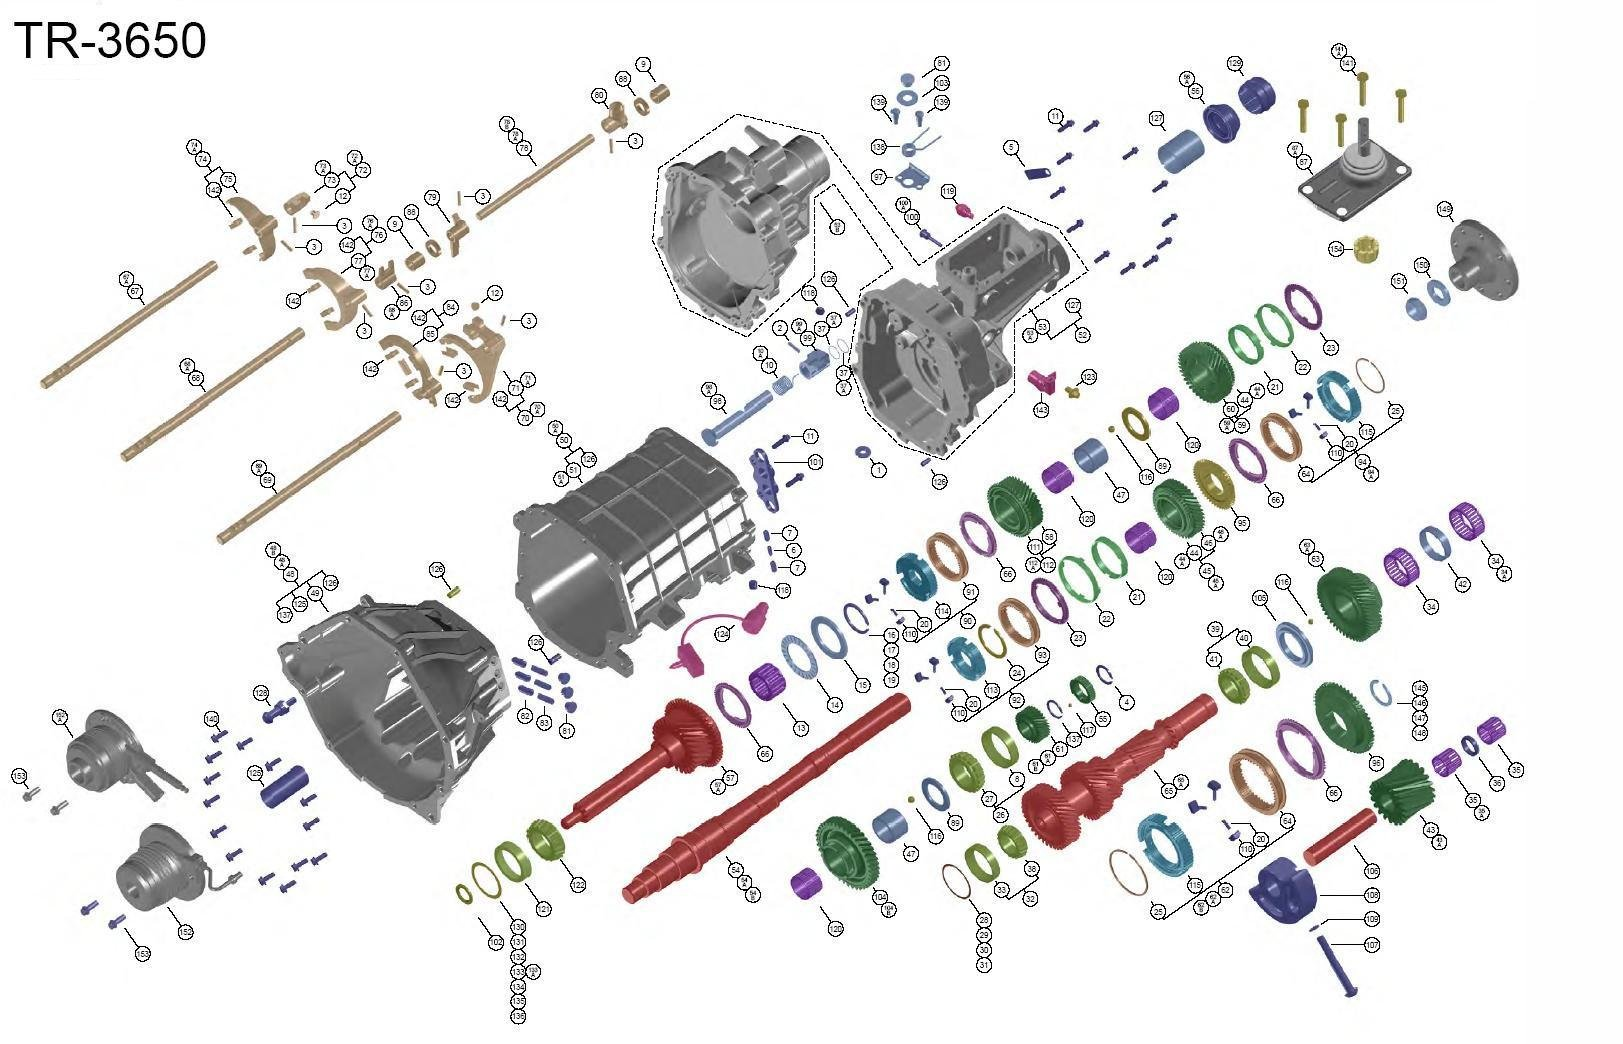 2005 mustang gt please help me identify and repair t3650 rh allfordmustangs com TR3650 Specs TR3650 Diagram